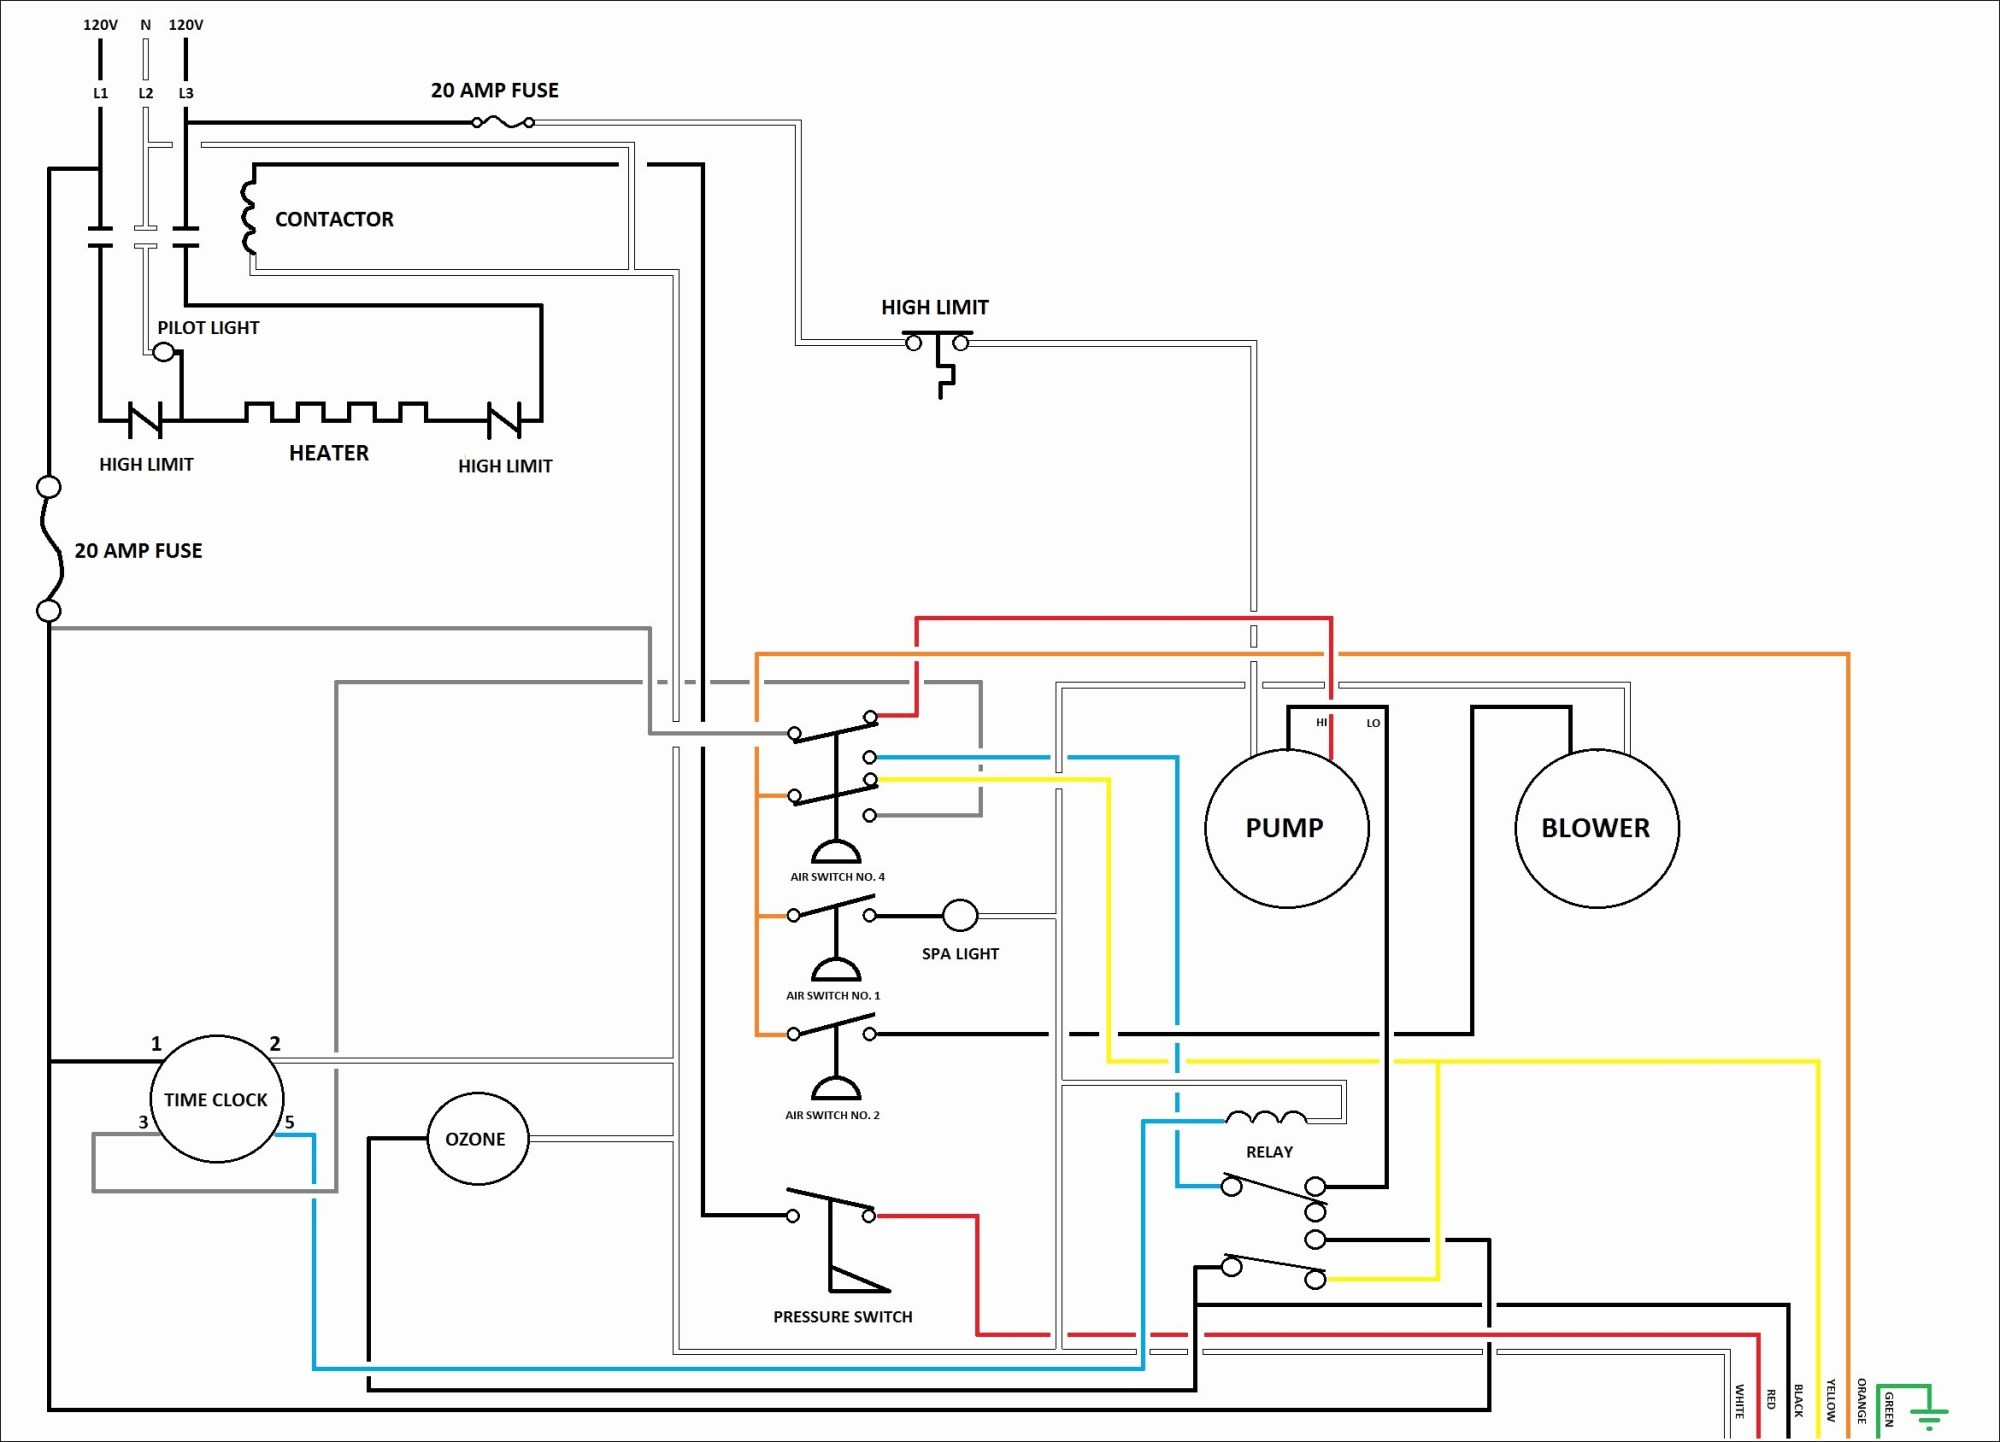 hight resolution of lt155 wiring diagram manual e books john deere lt155 wiring diagram